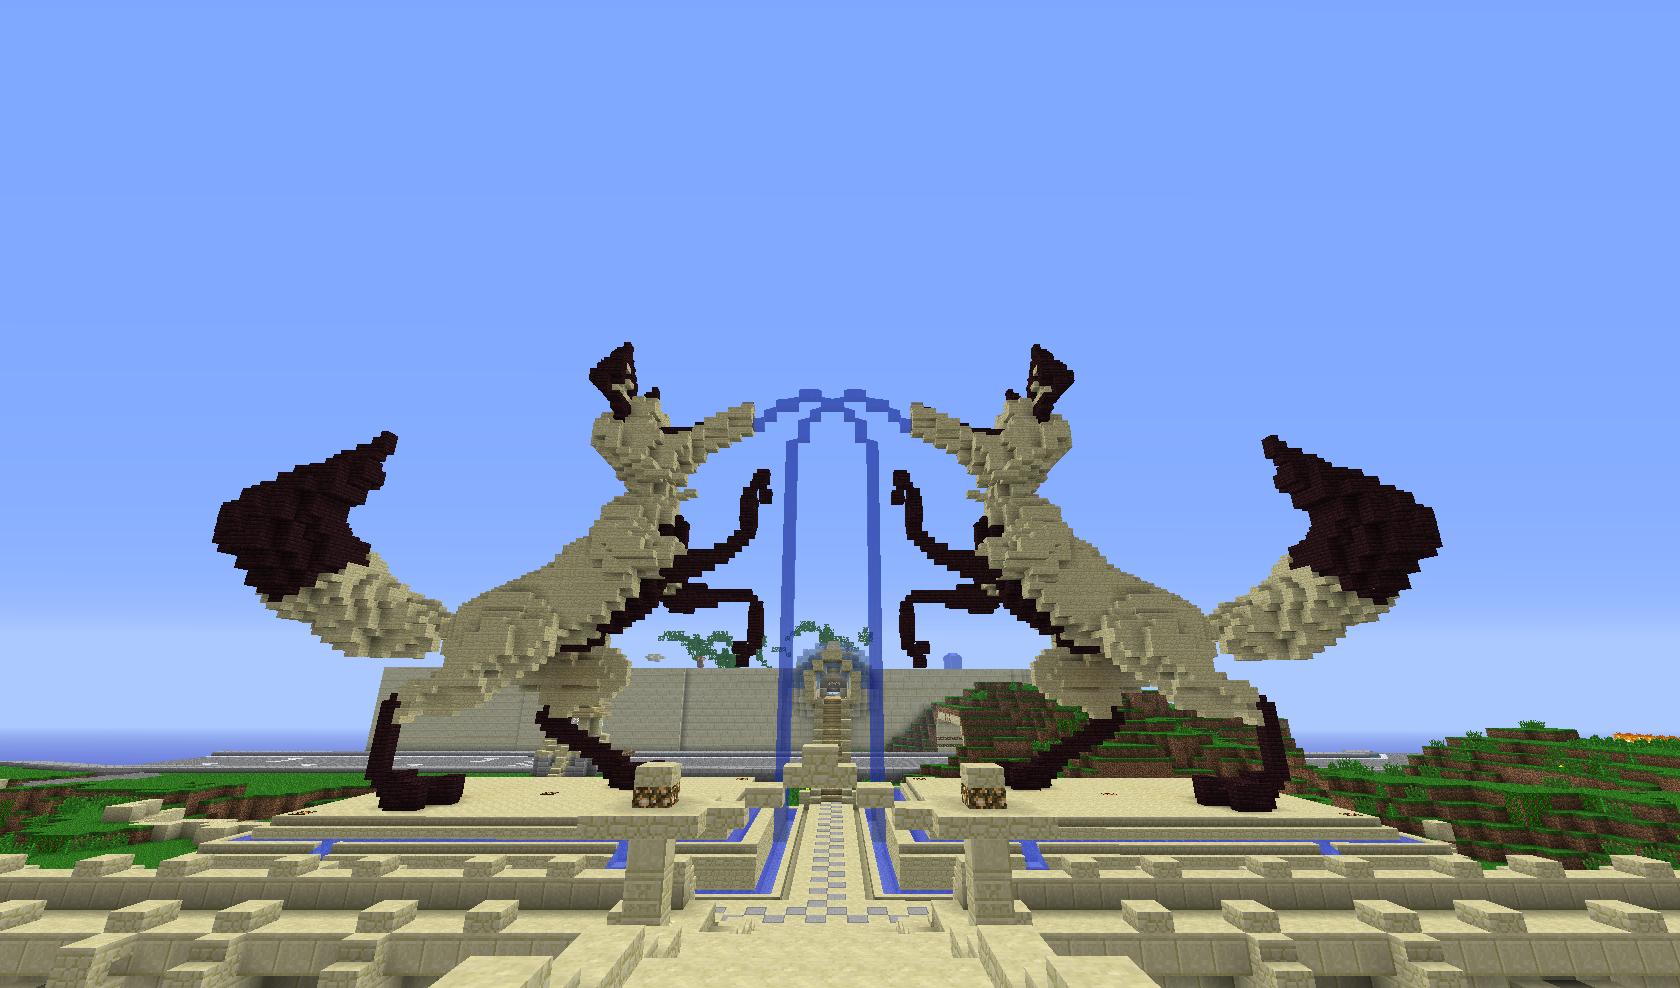 fontanna z dwóch